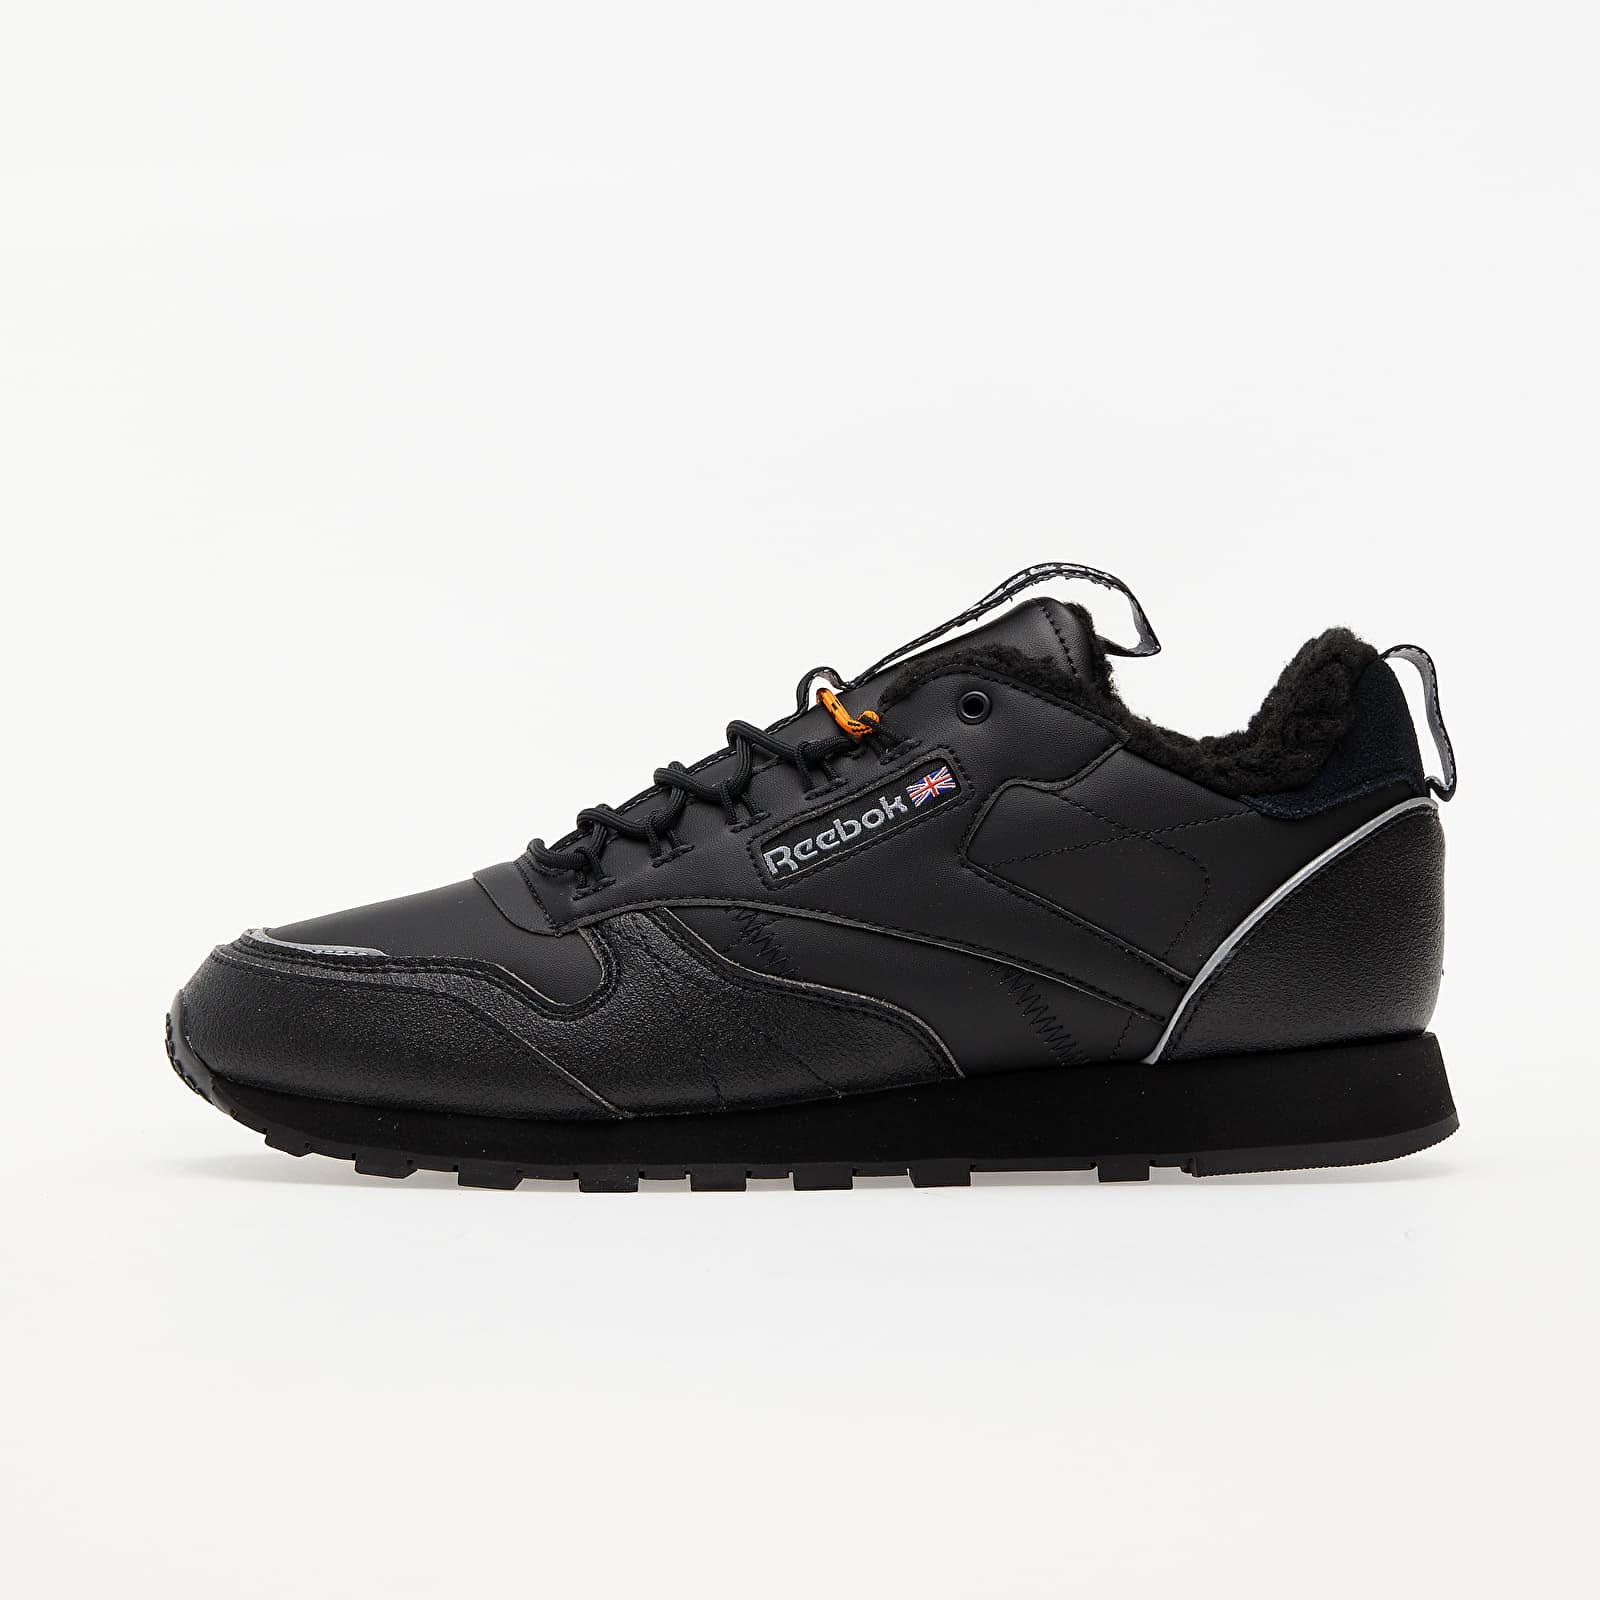 Reebok Classic Leather MU Black/ Black/ High Vivid Orange FZ1188